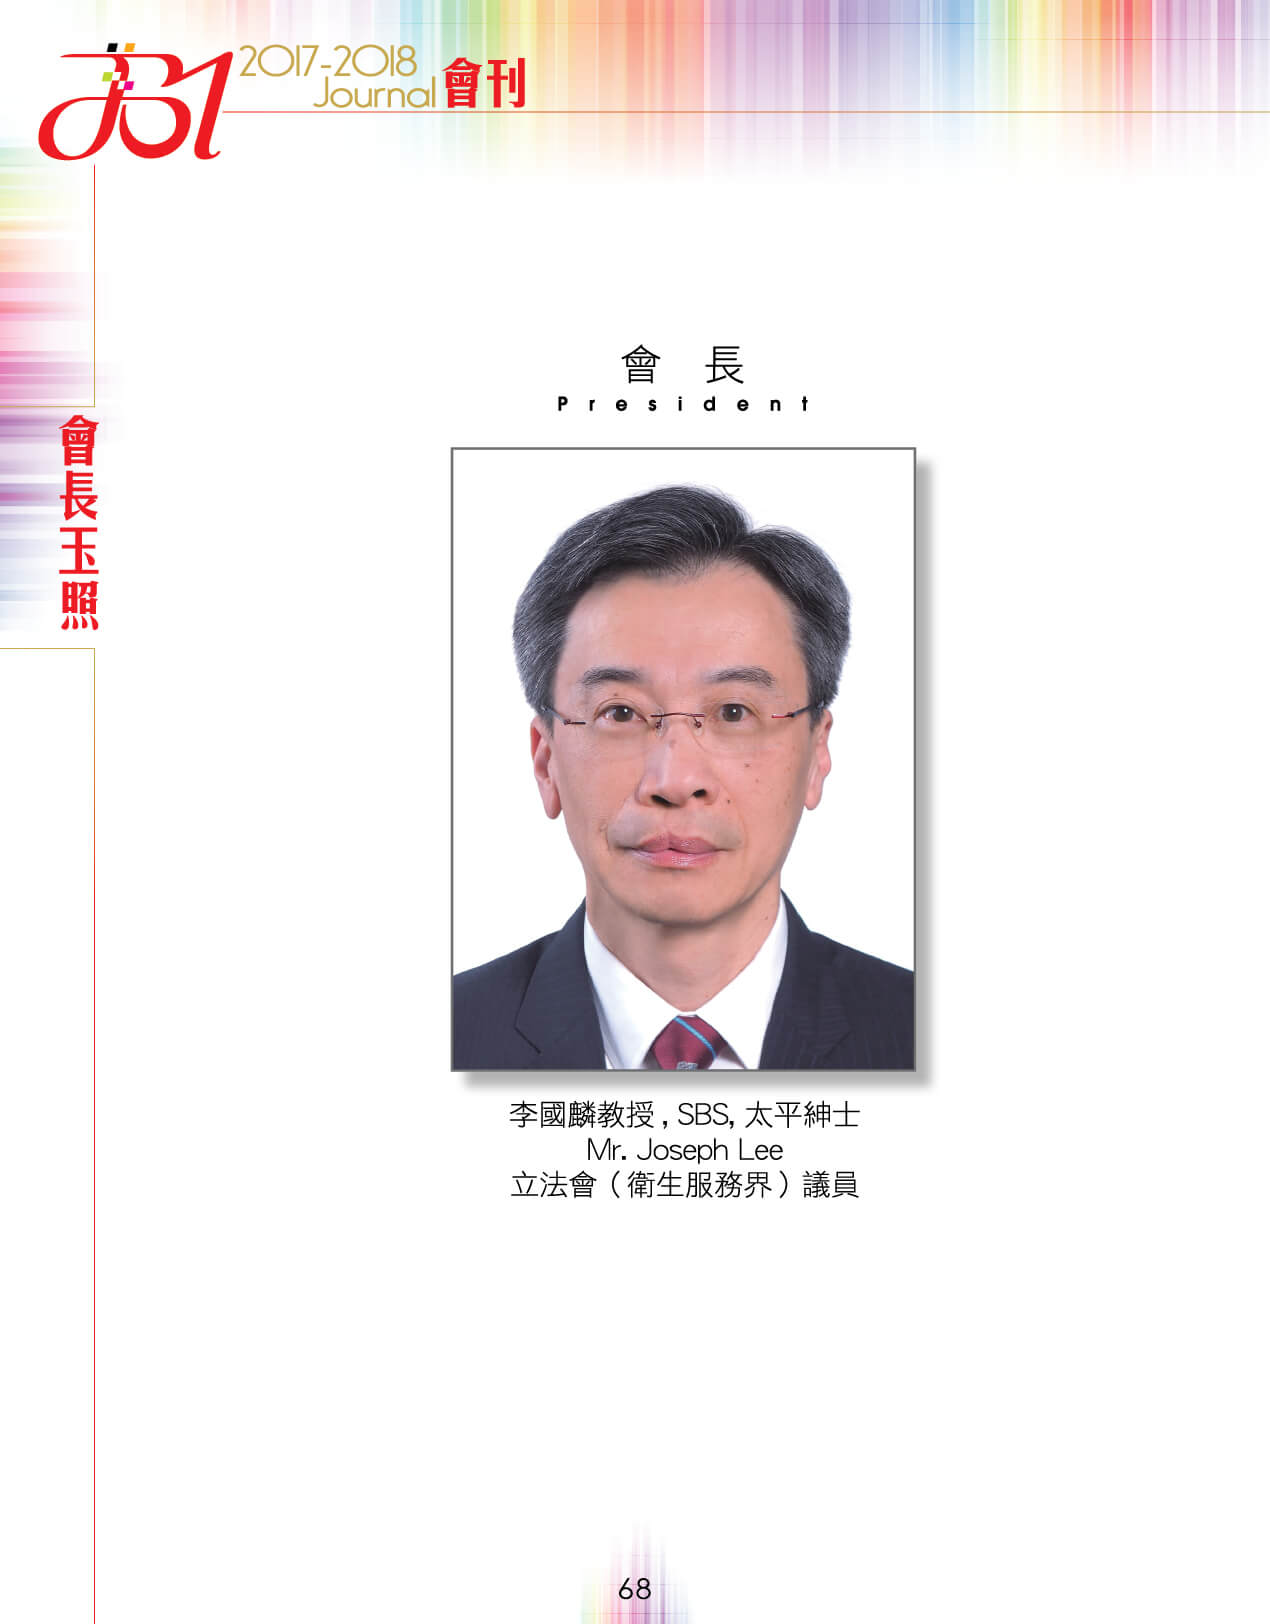 P068-2017-2018-Chairman-02